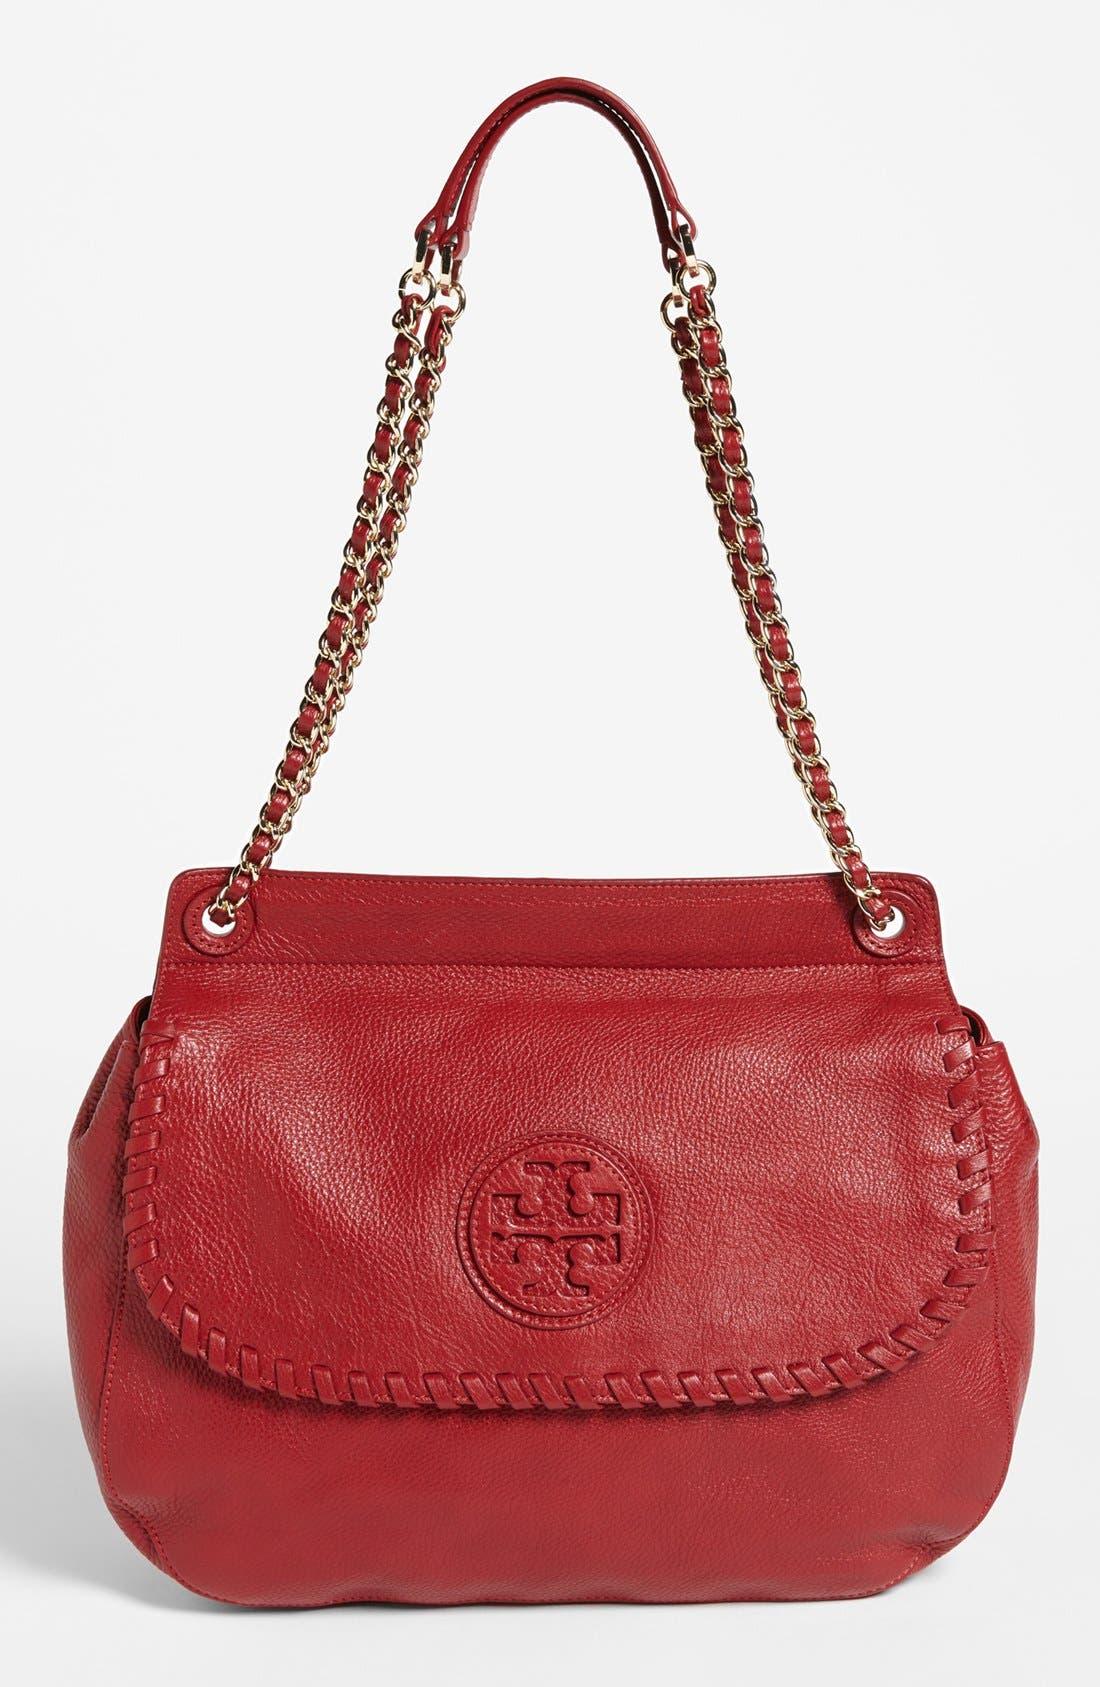 Main Image - Tory Burch 'Marion' Leather Saddlebag